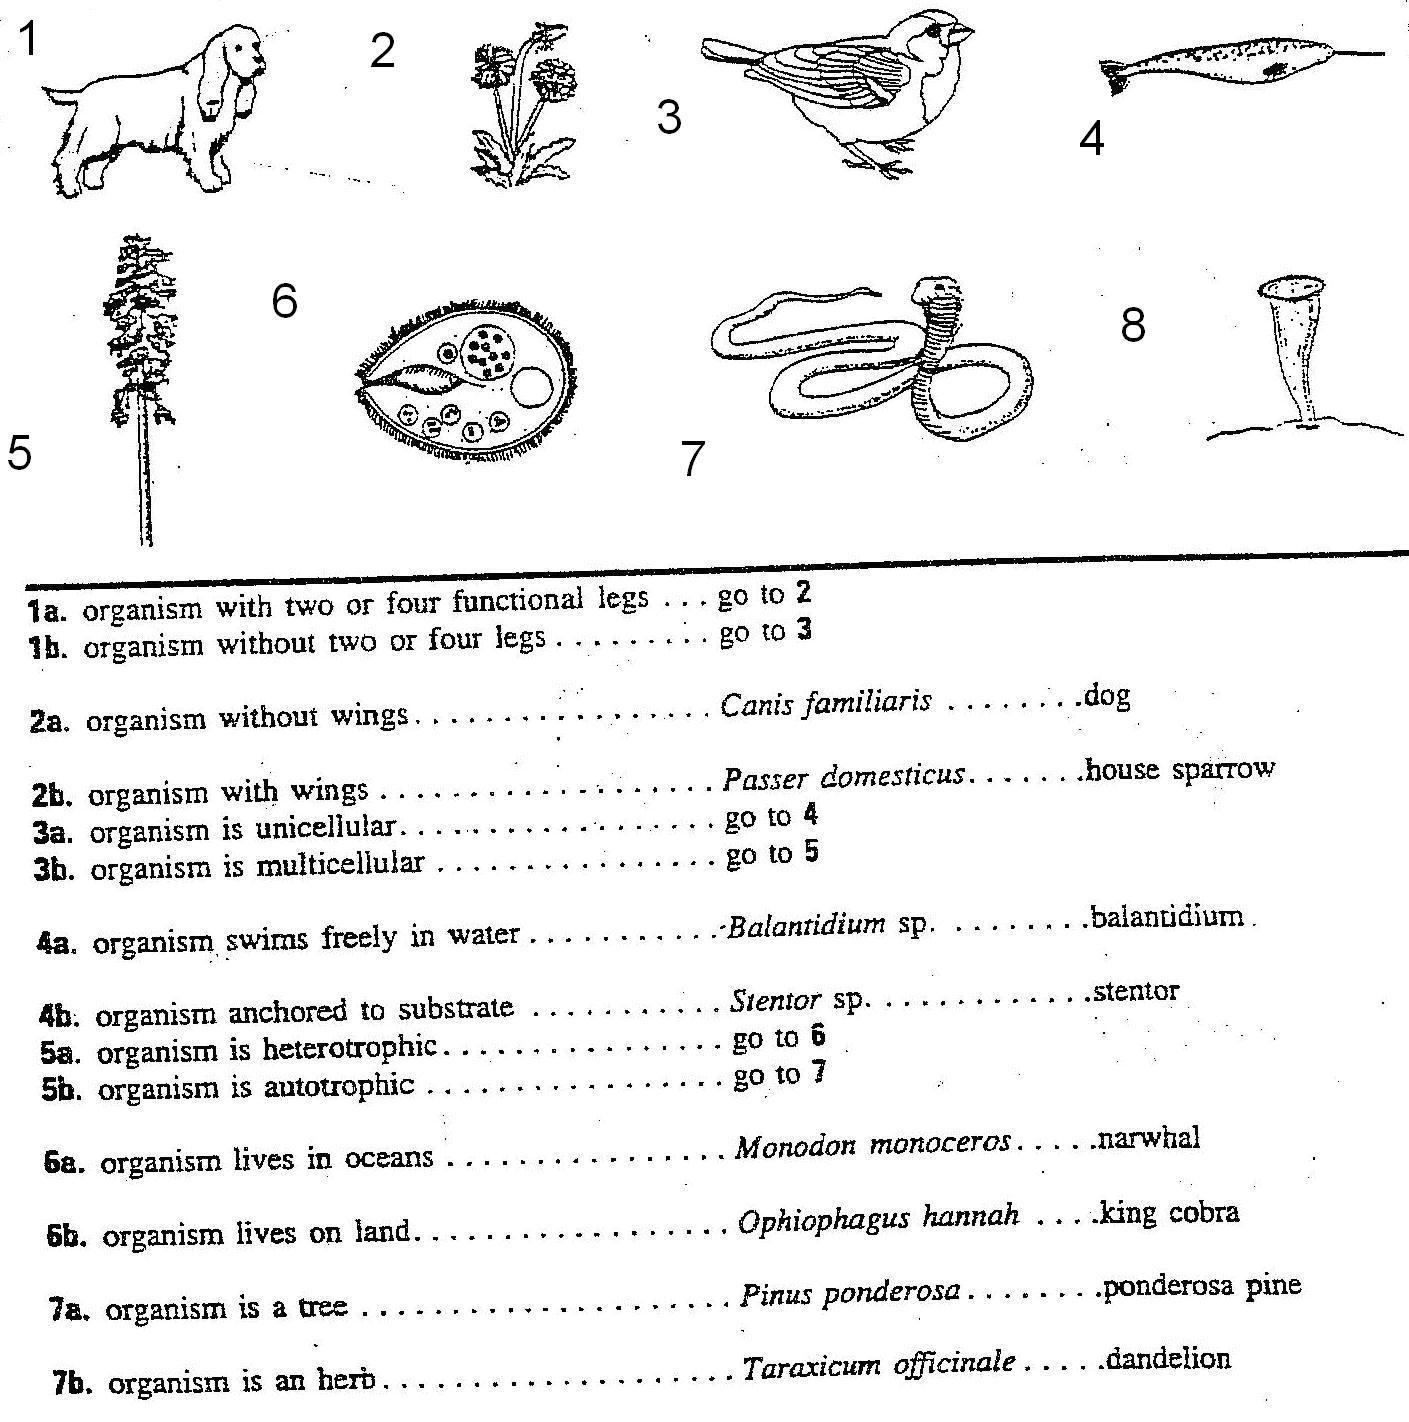 Dichotomouskey1 Ssjeiq Jpg 1409 1422 Dichotomous Key